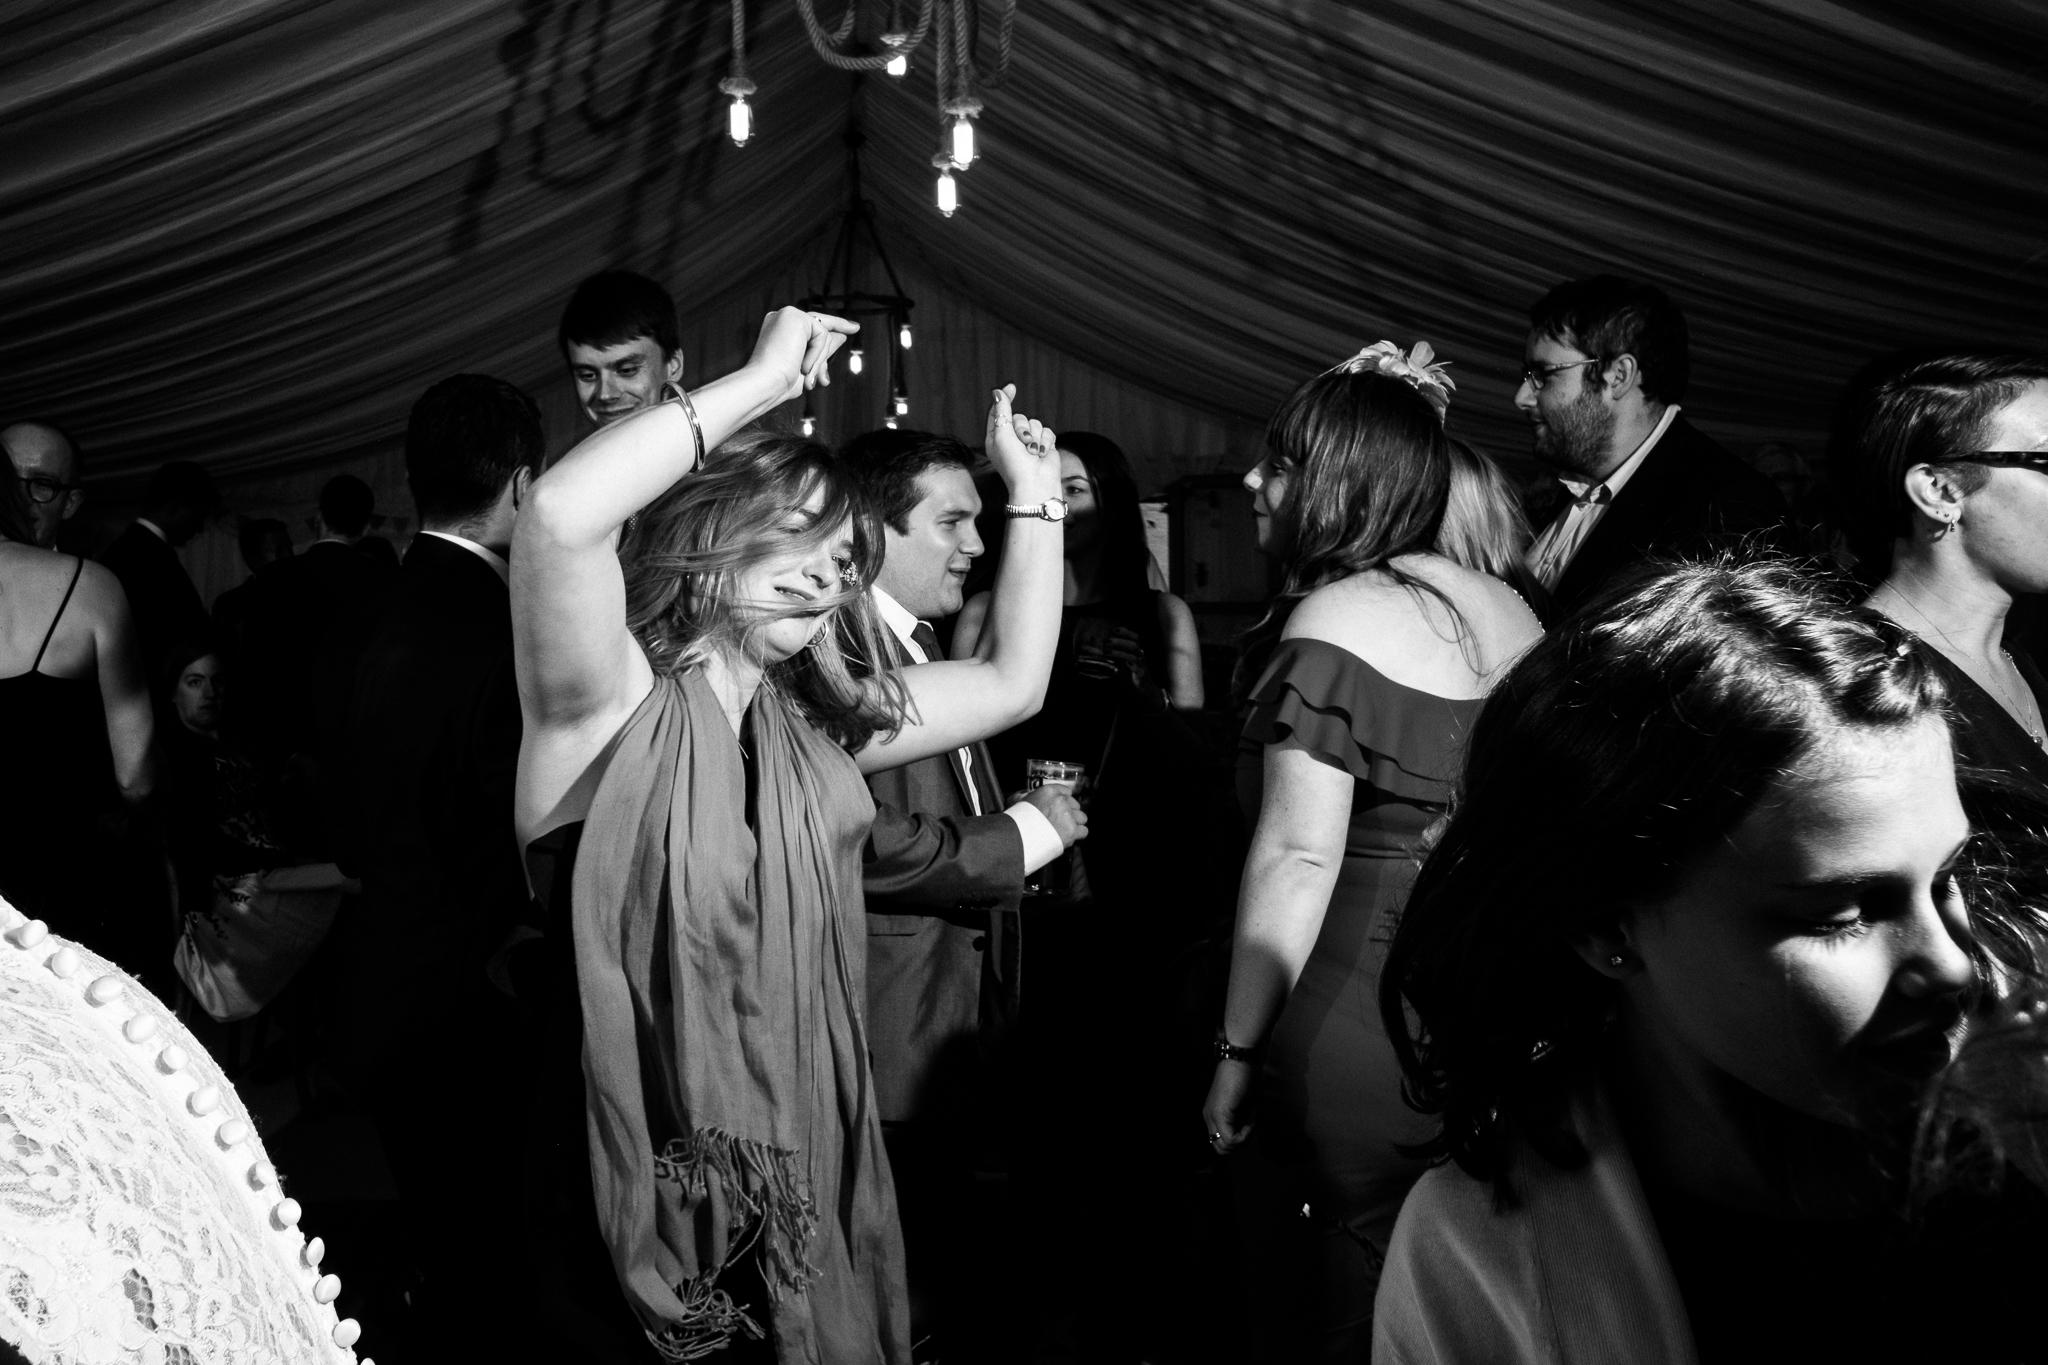 Relaxed Documentary Wedding Photography at The Wizard Inn, Alderley Edge Cheshire - Jenny Harper-80.jpg